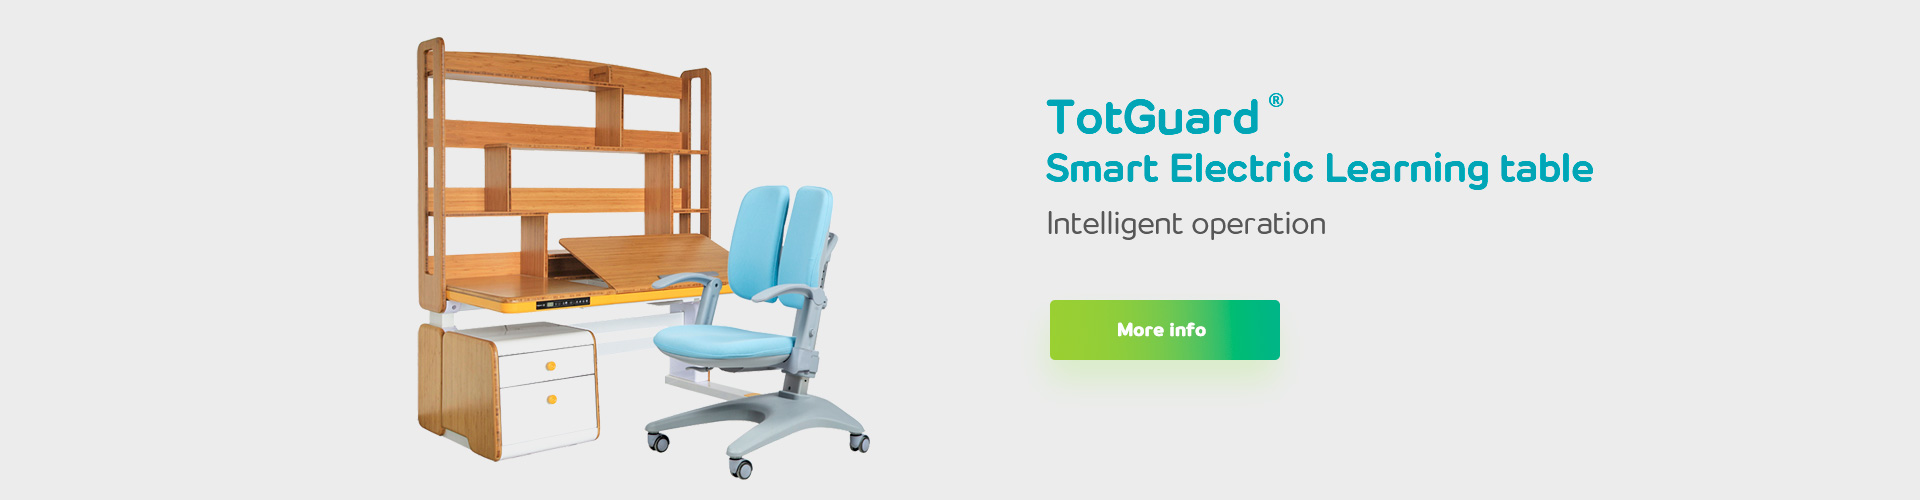 TotGuard Smart Electric